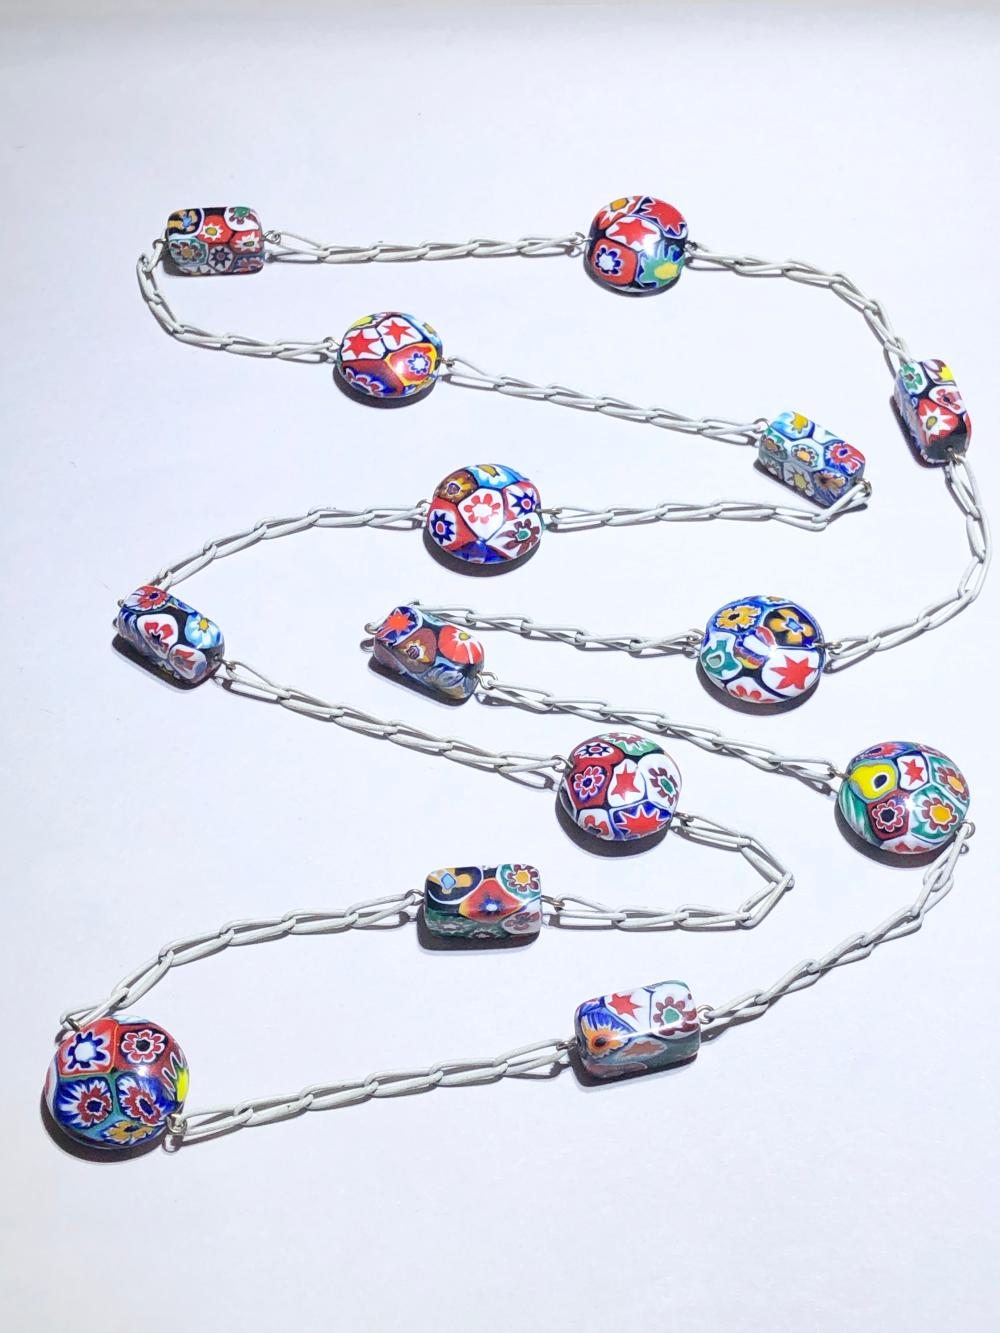 Sold Price Vintage Mid Century Venetian Murano Millefiori Art Glass Bead Necklace April 1 0120 6 15 Pm Edt